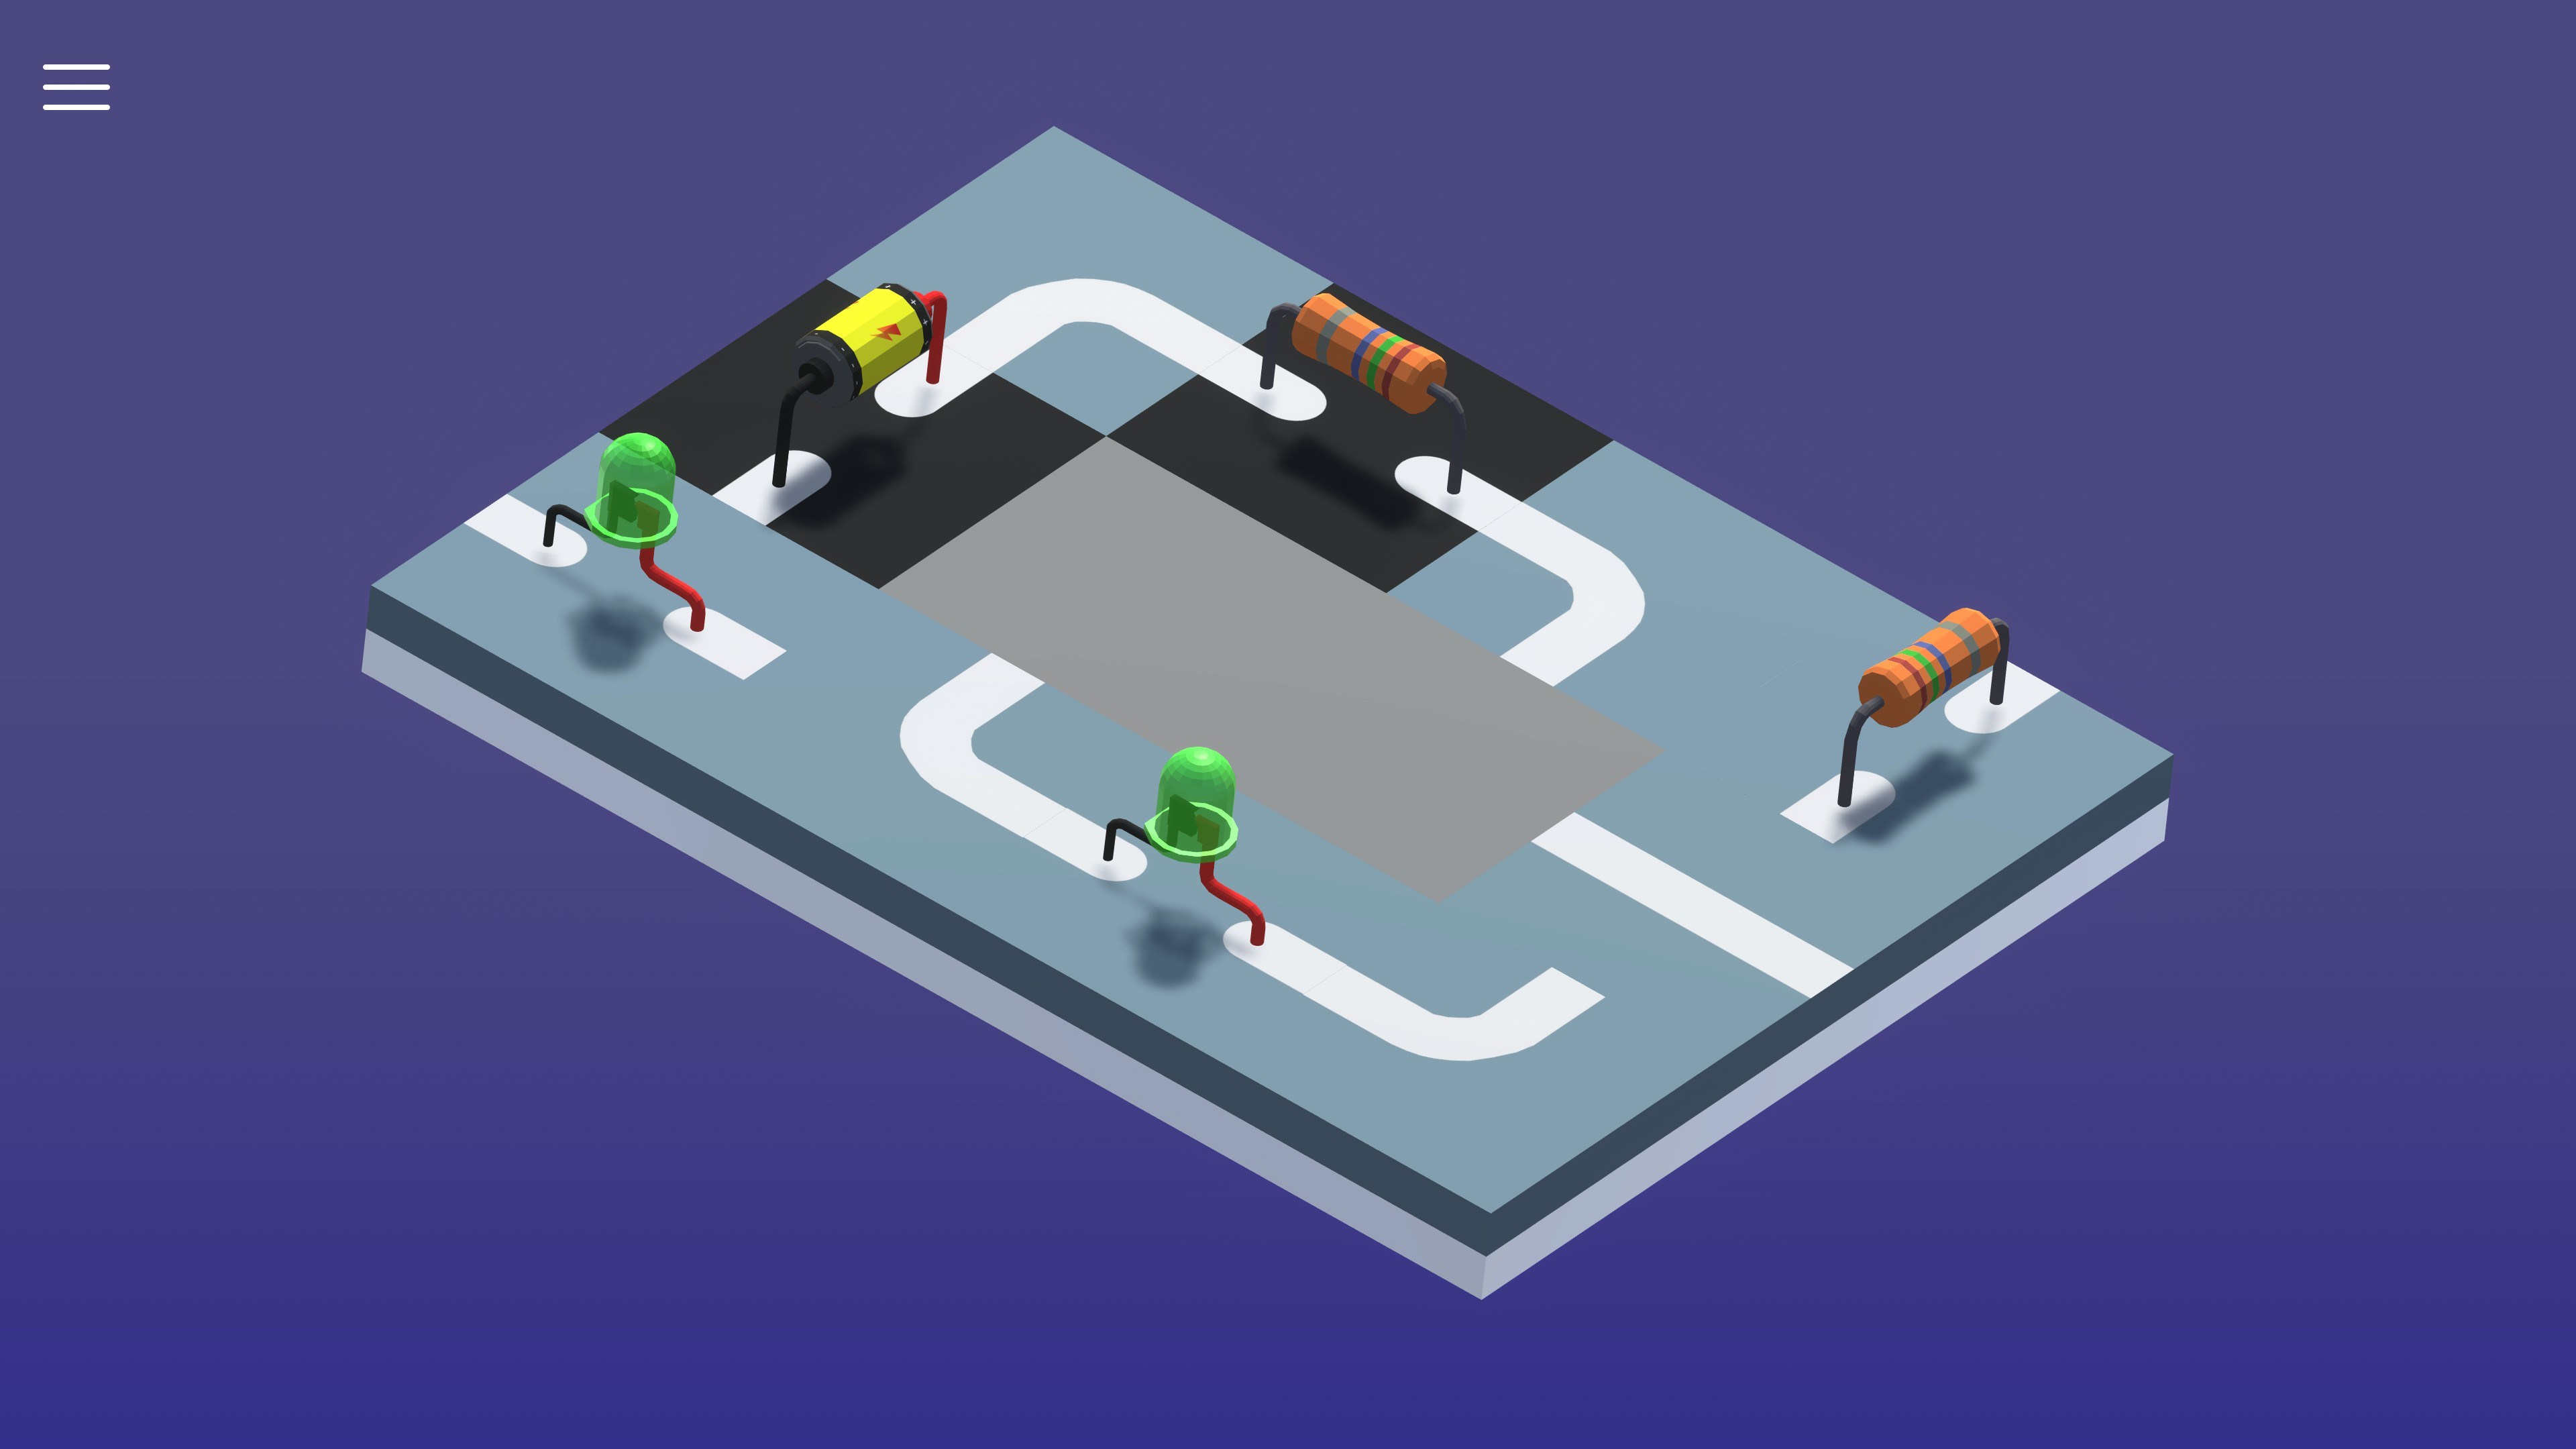 Puzzletronics Analog Eletronics game screenshot.